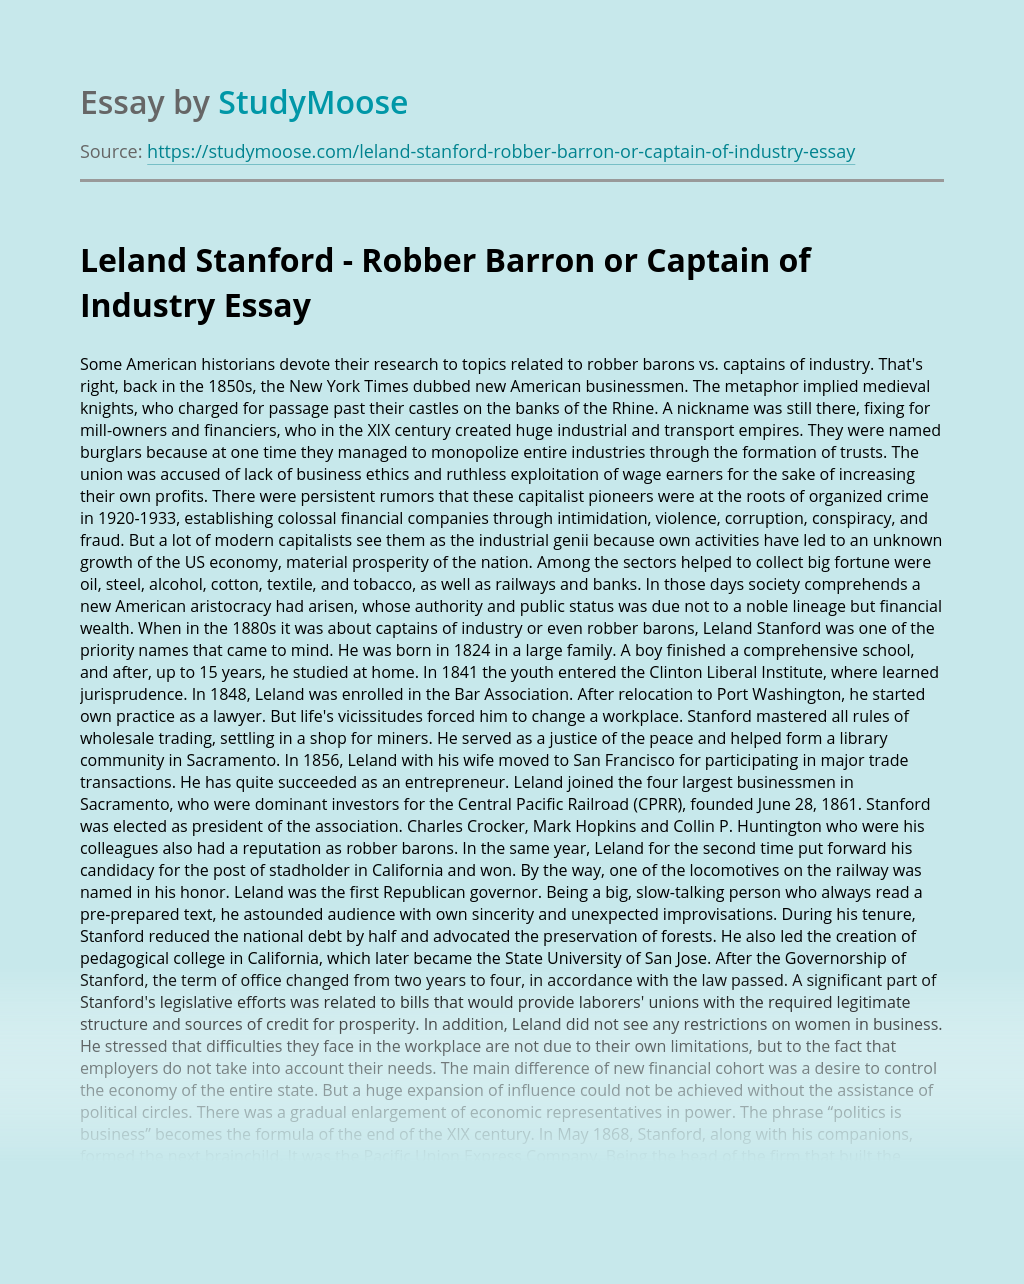 Leland Stanford – Robber Barron or Captain of Industry